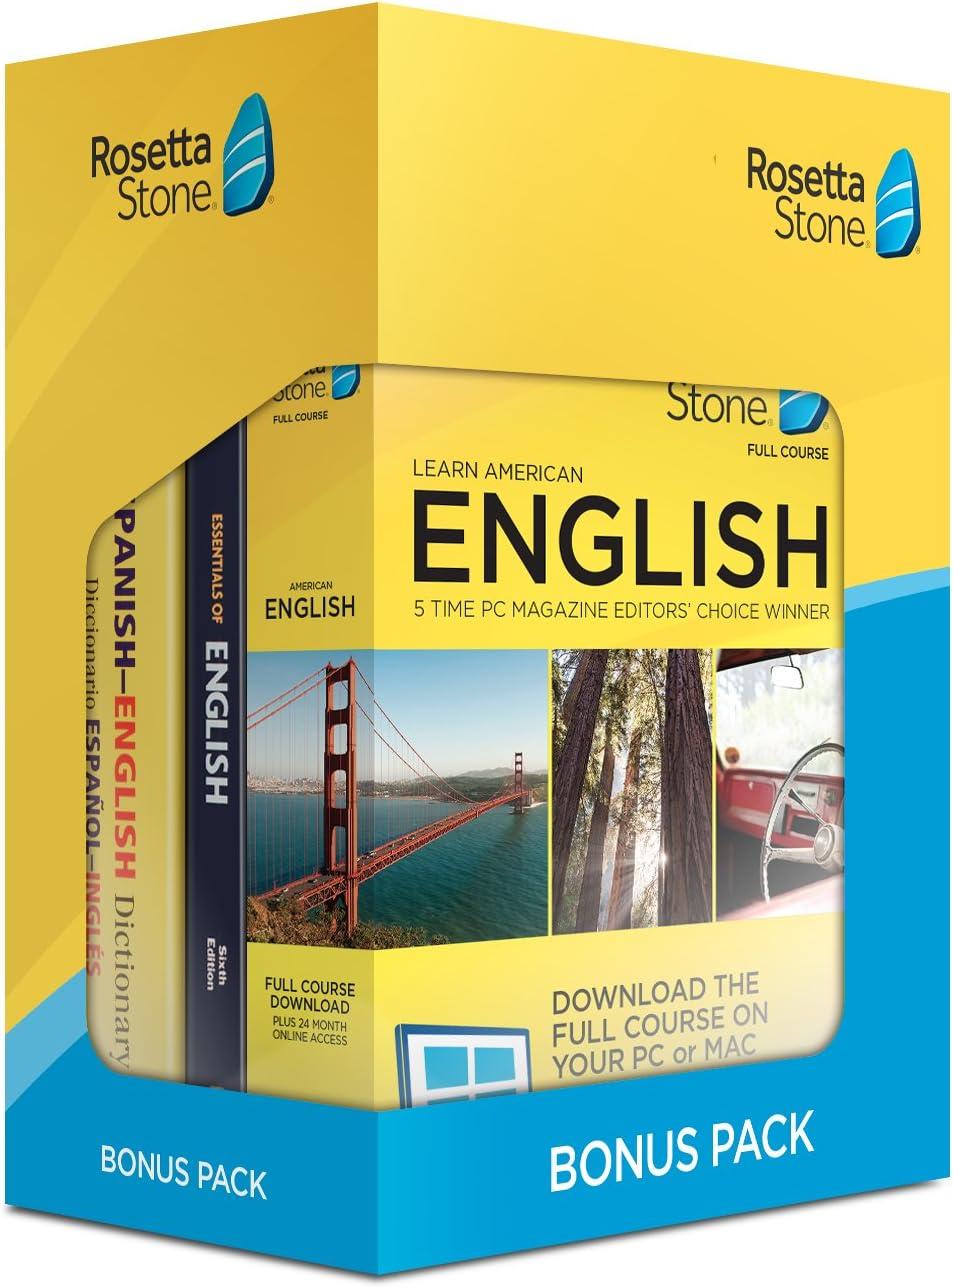 Rosetta stone english for mac download free